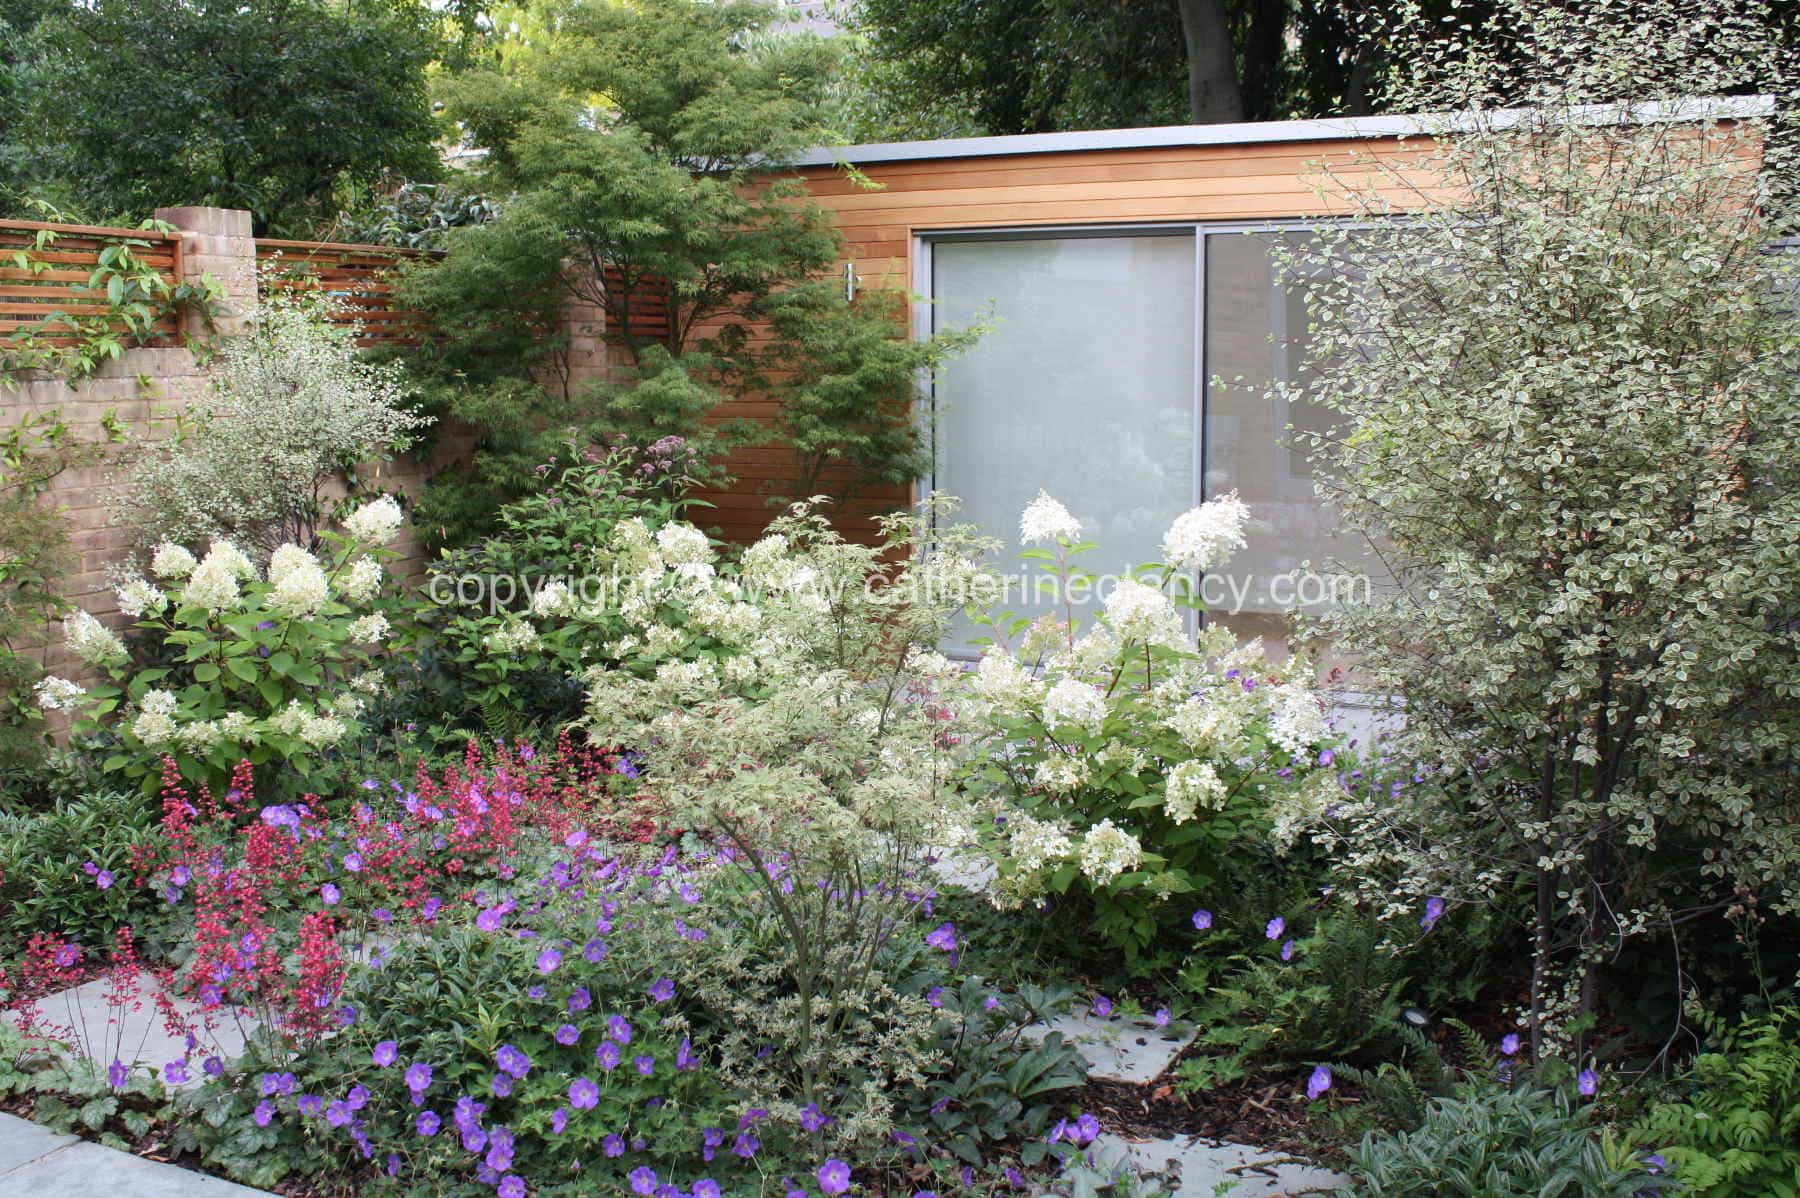 artist-studio-garden-1